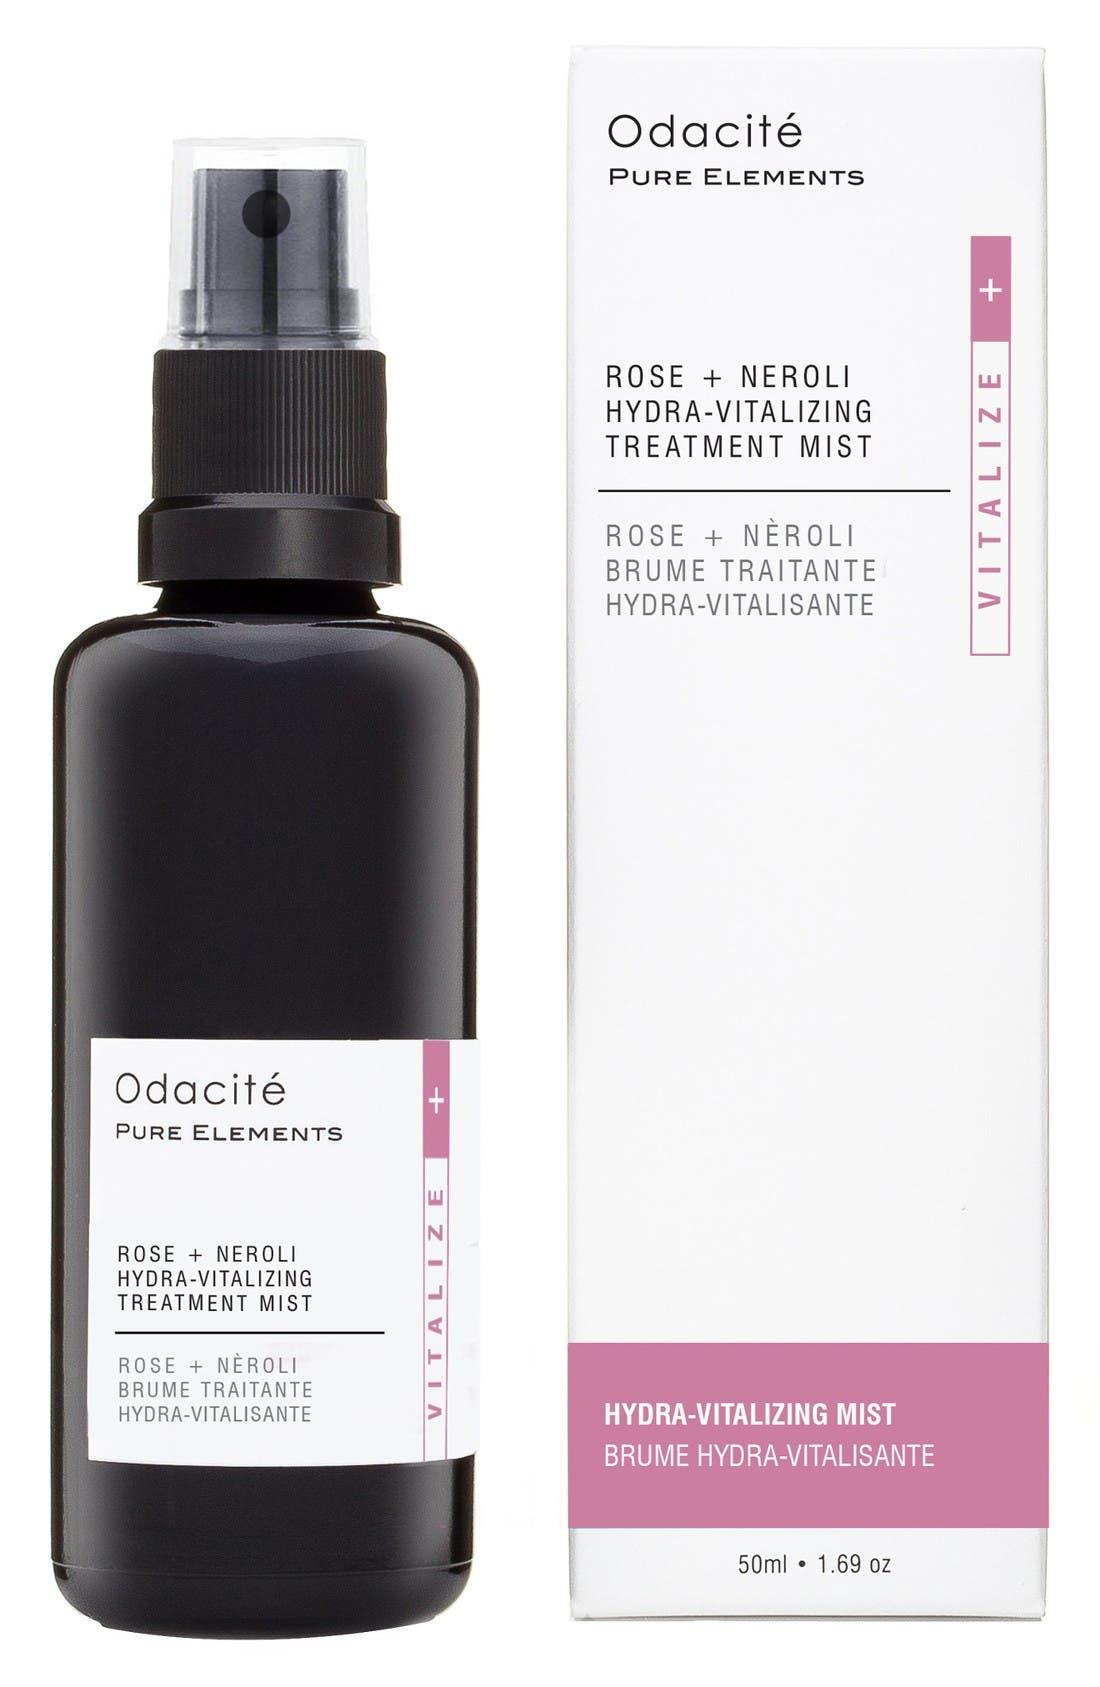 Odacité Rose + Neroli Hydra-Vitalizing Treatment Mist